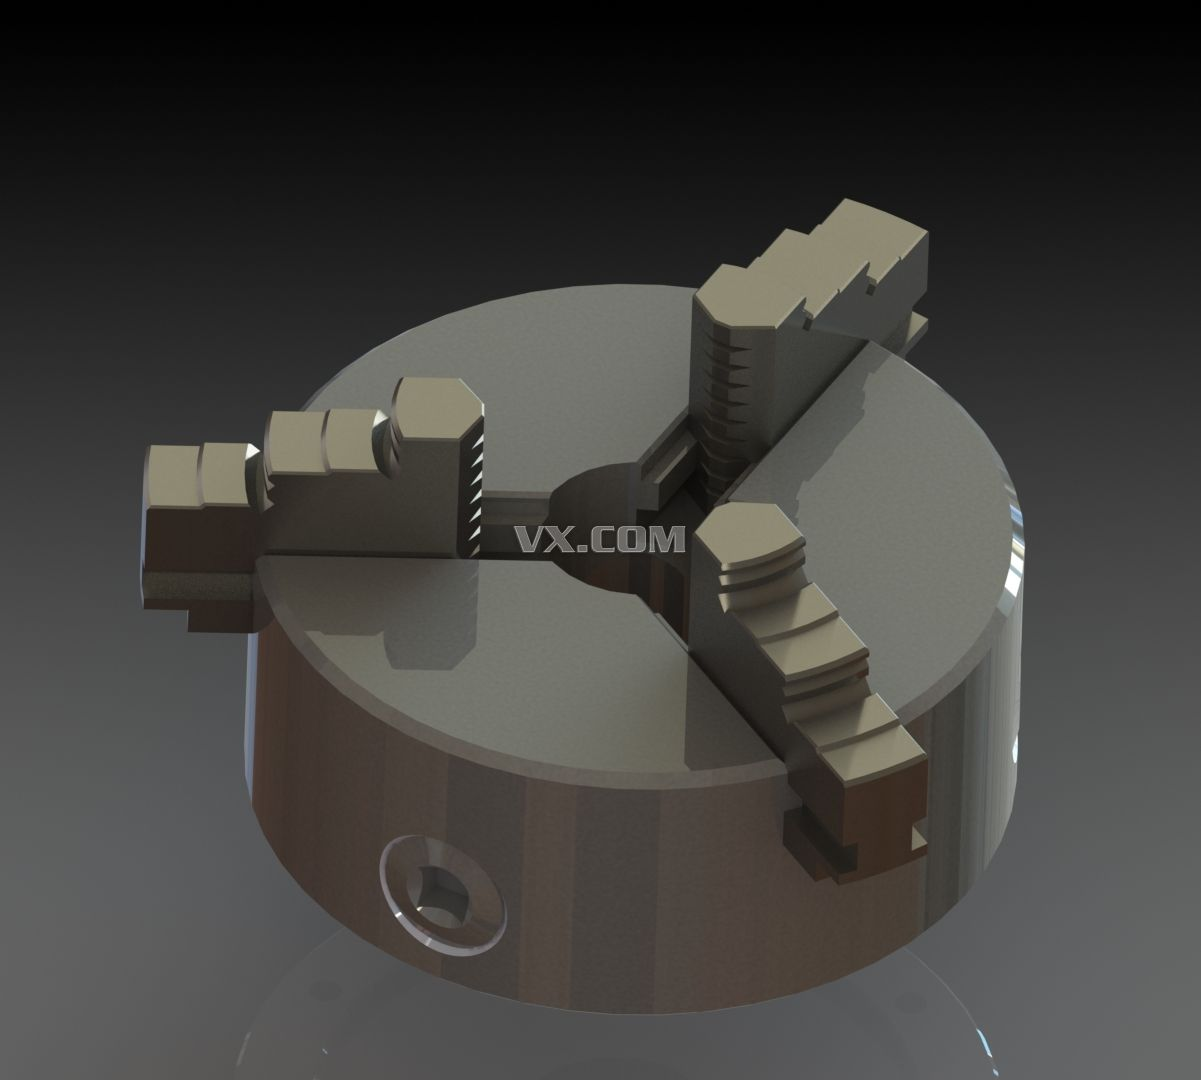 solidworks 三爪卡盘结构图_solidworks_机械设备_3d